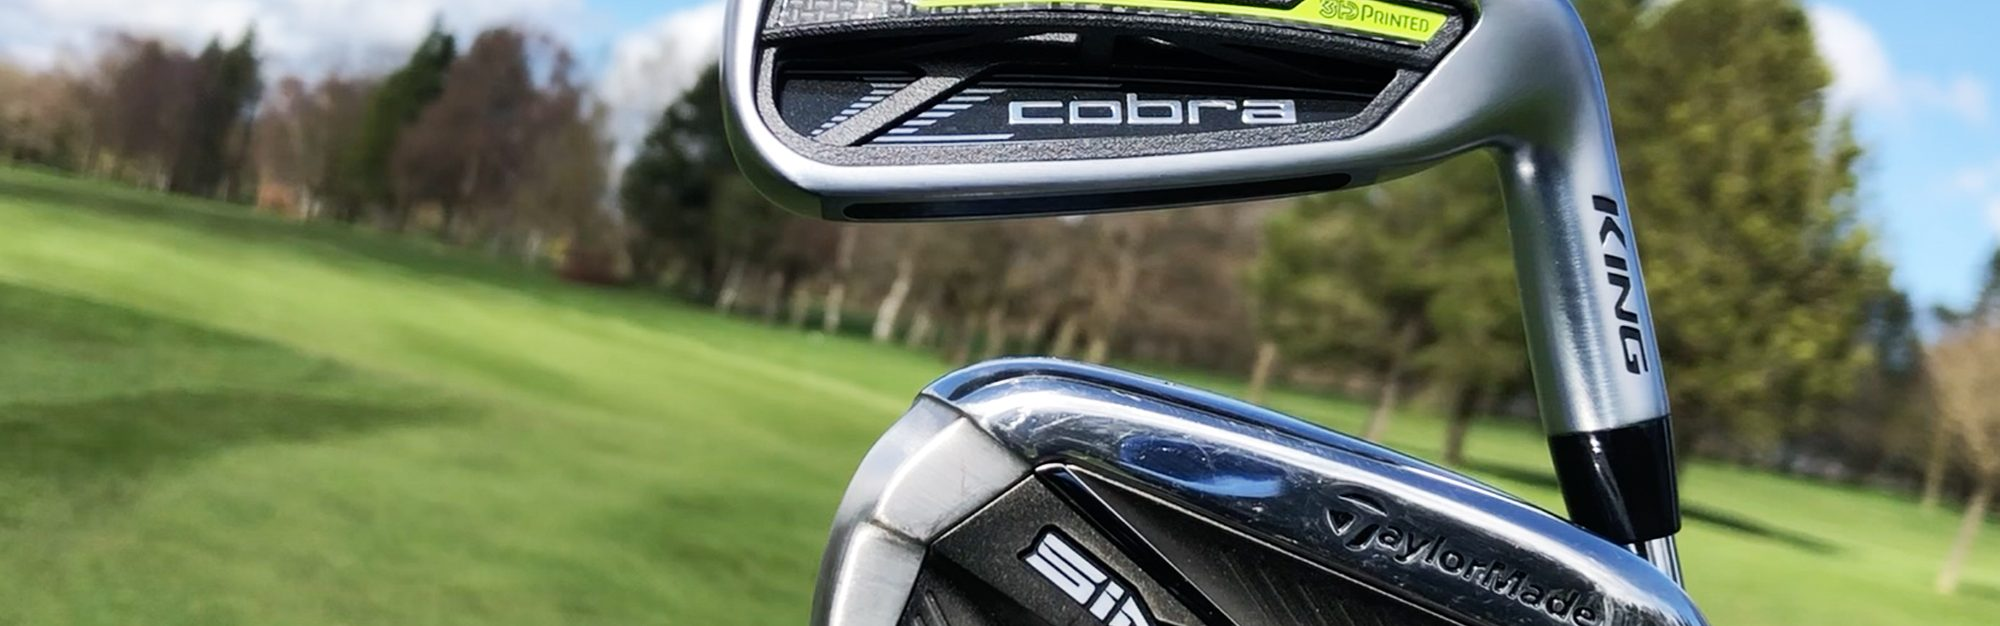 Irons World Cup 2021: Cobra Radspeed vs TaylorMade SIM2 Max